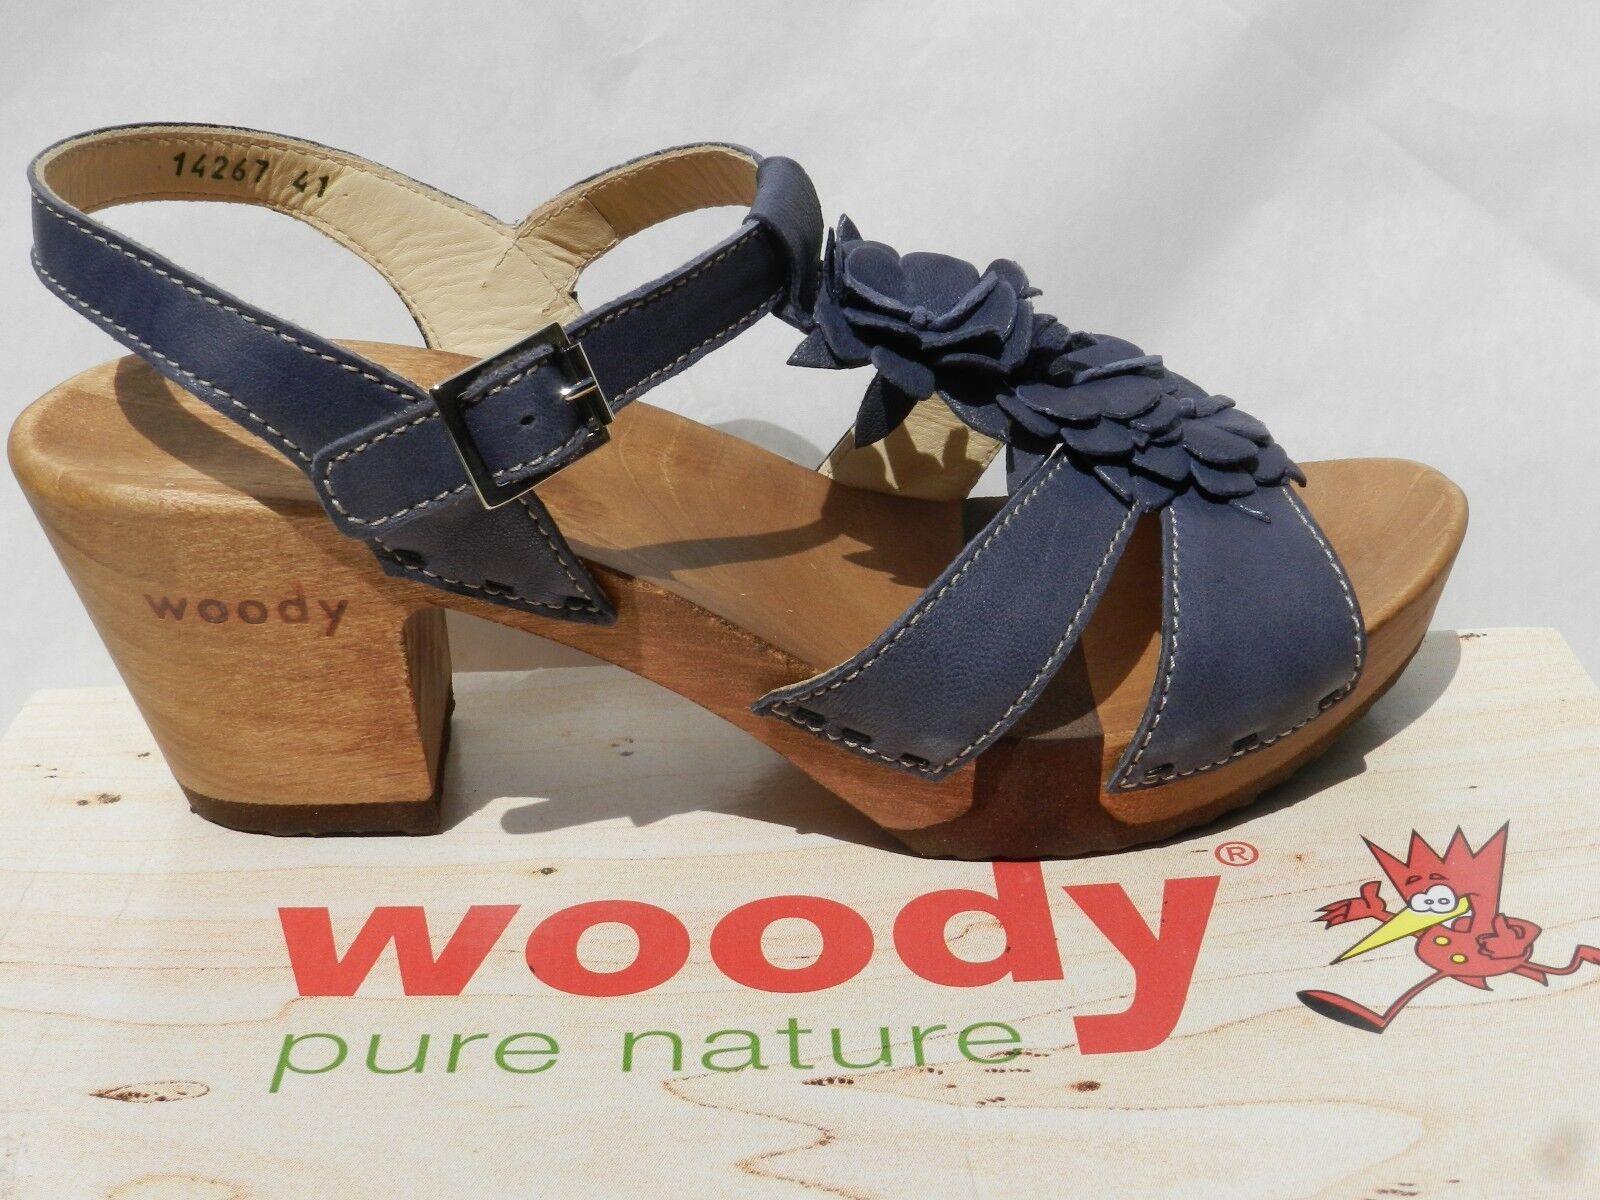 Woody clogs shoes sarah womens 41 clogs sandals pumps uk8 new